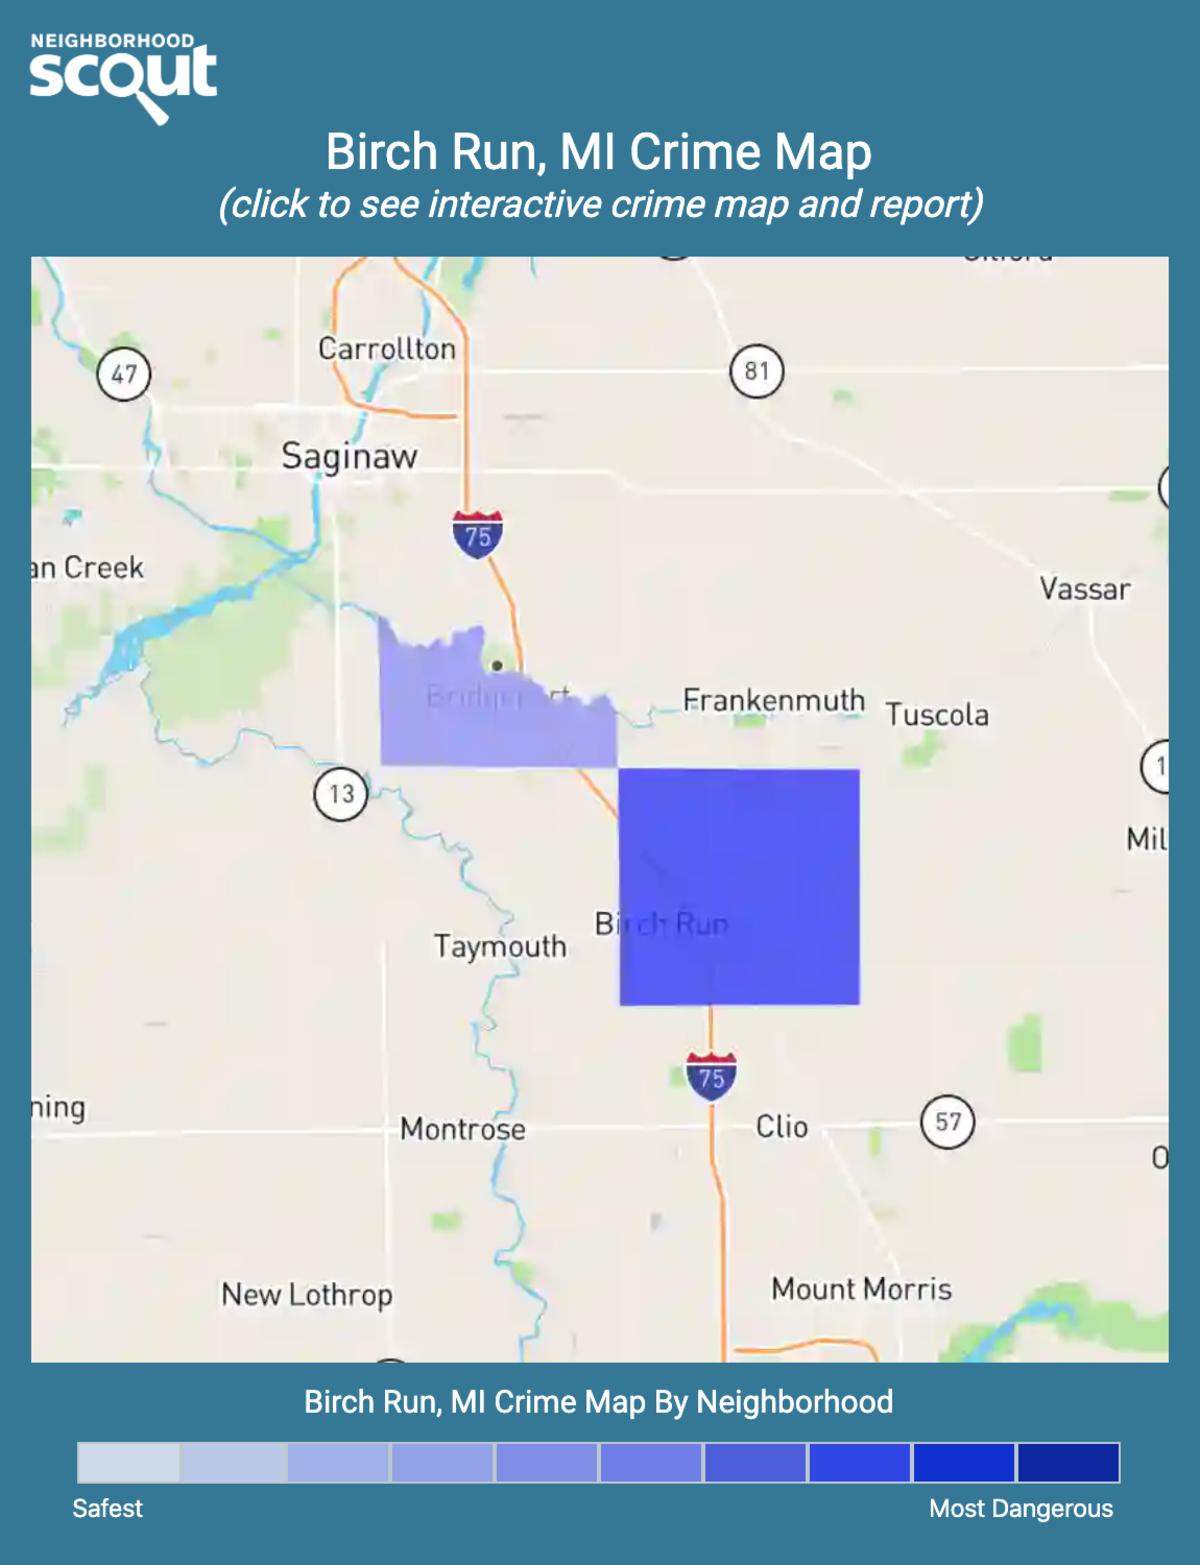 Birch Run, Michigan crime map